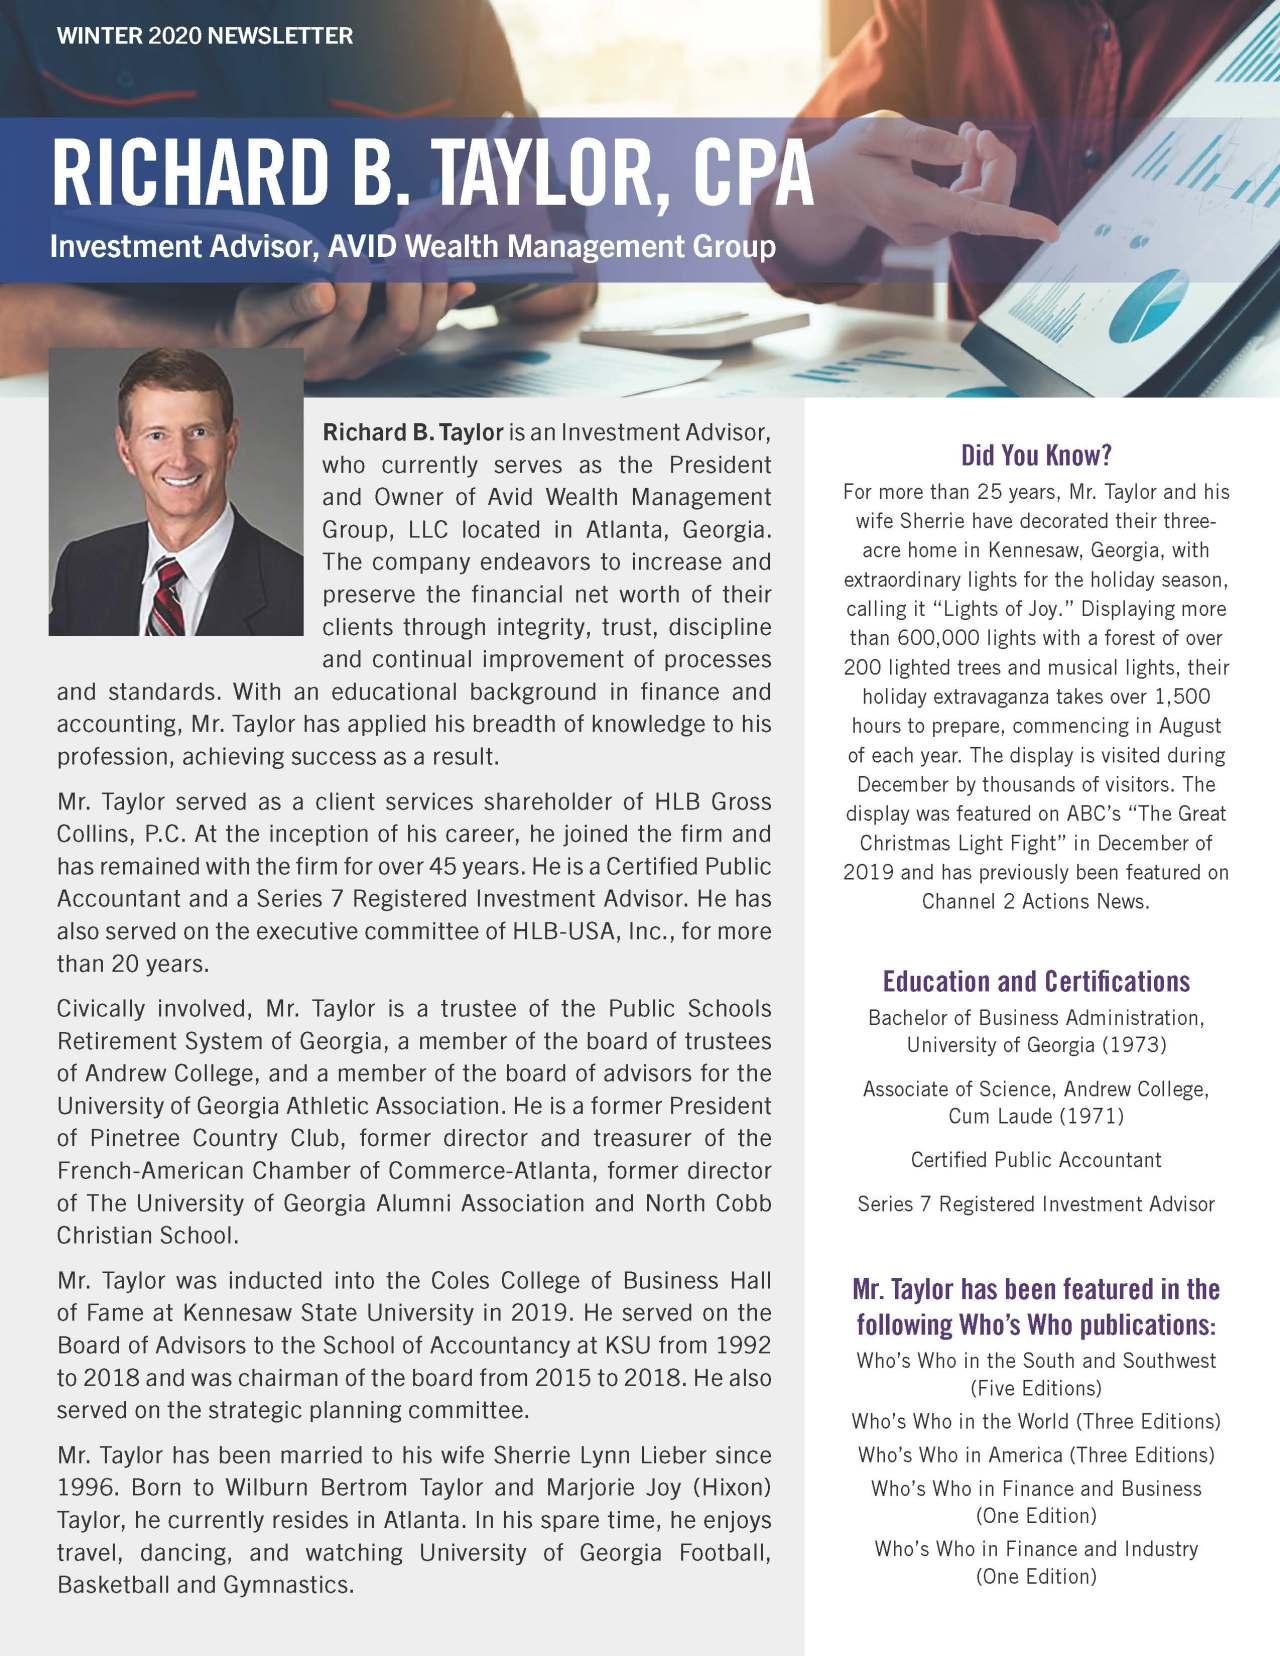 Taylor, Richard 4404883_4311100 Newsletter REVISED